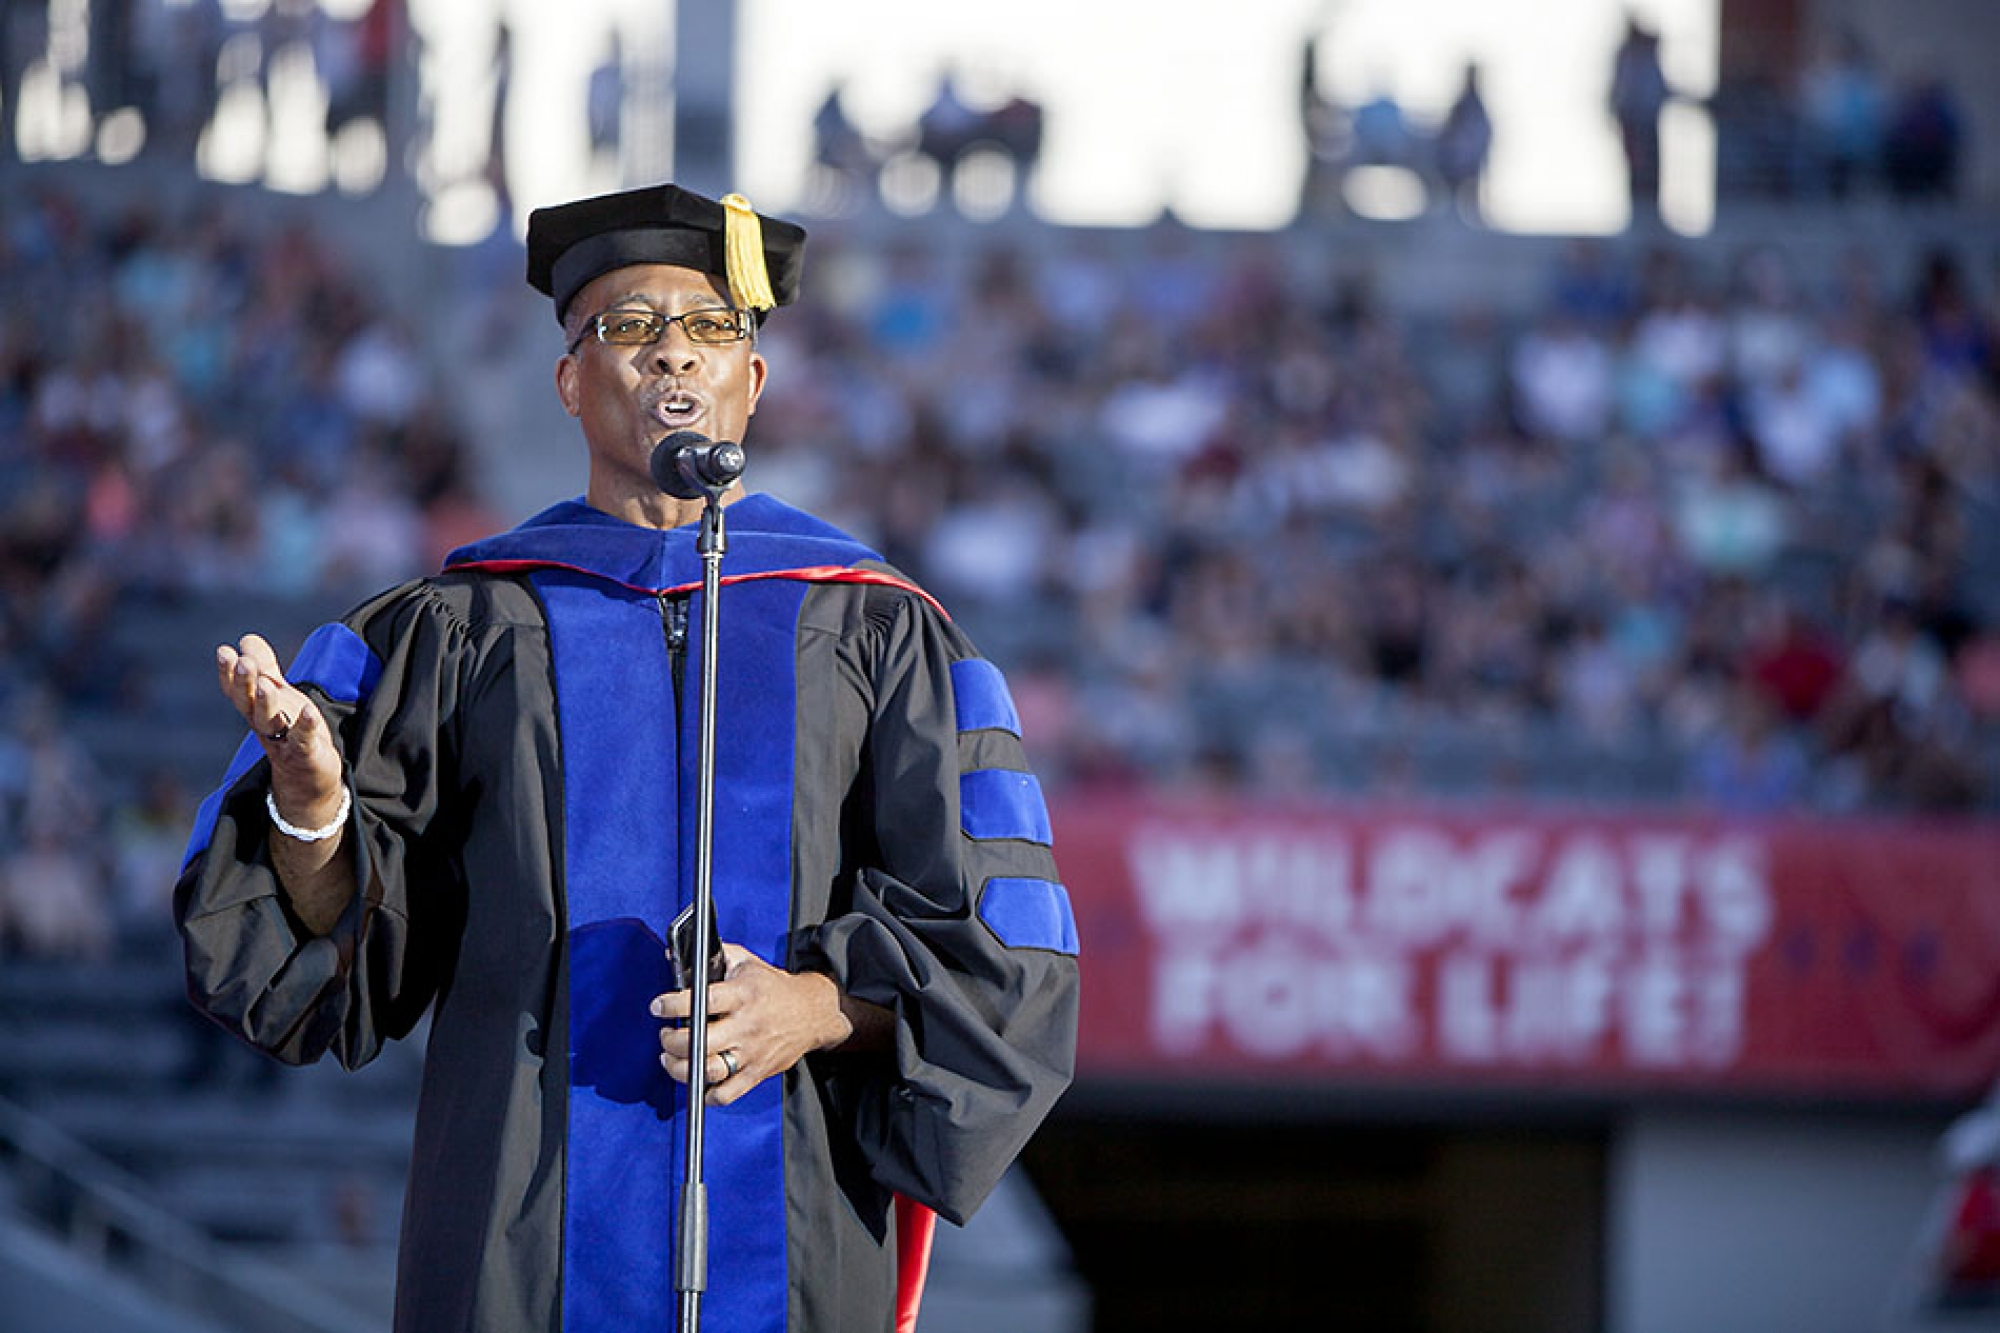 Bryan Carter, an associate professor of Africana studies, addressed the graduates during a segment called Final Office Hours.